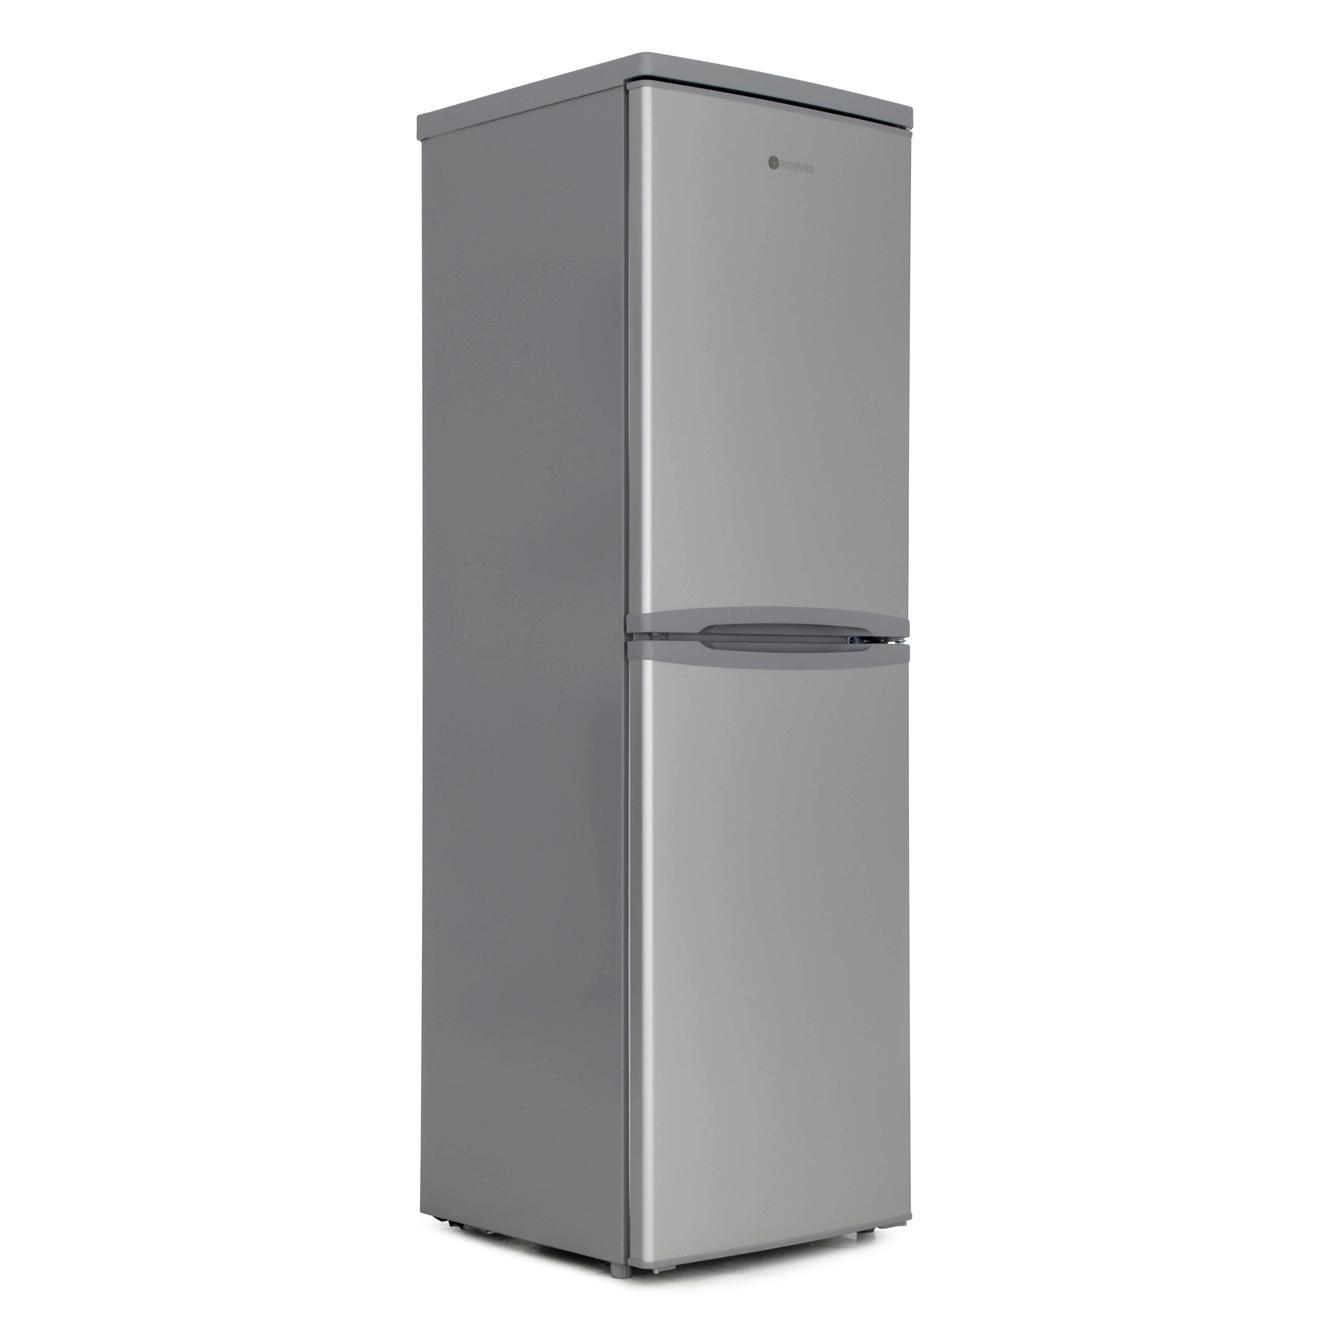 Hoover HSC574S Fridge Freezer